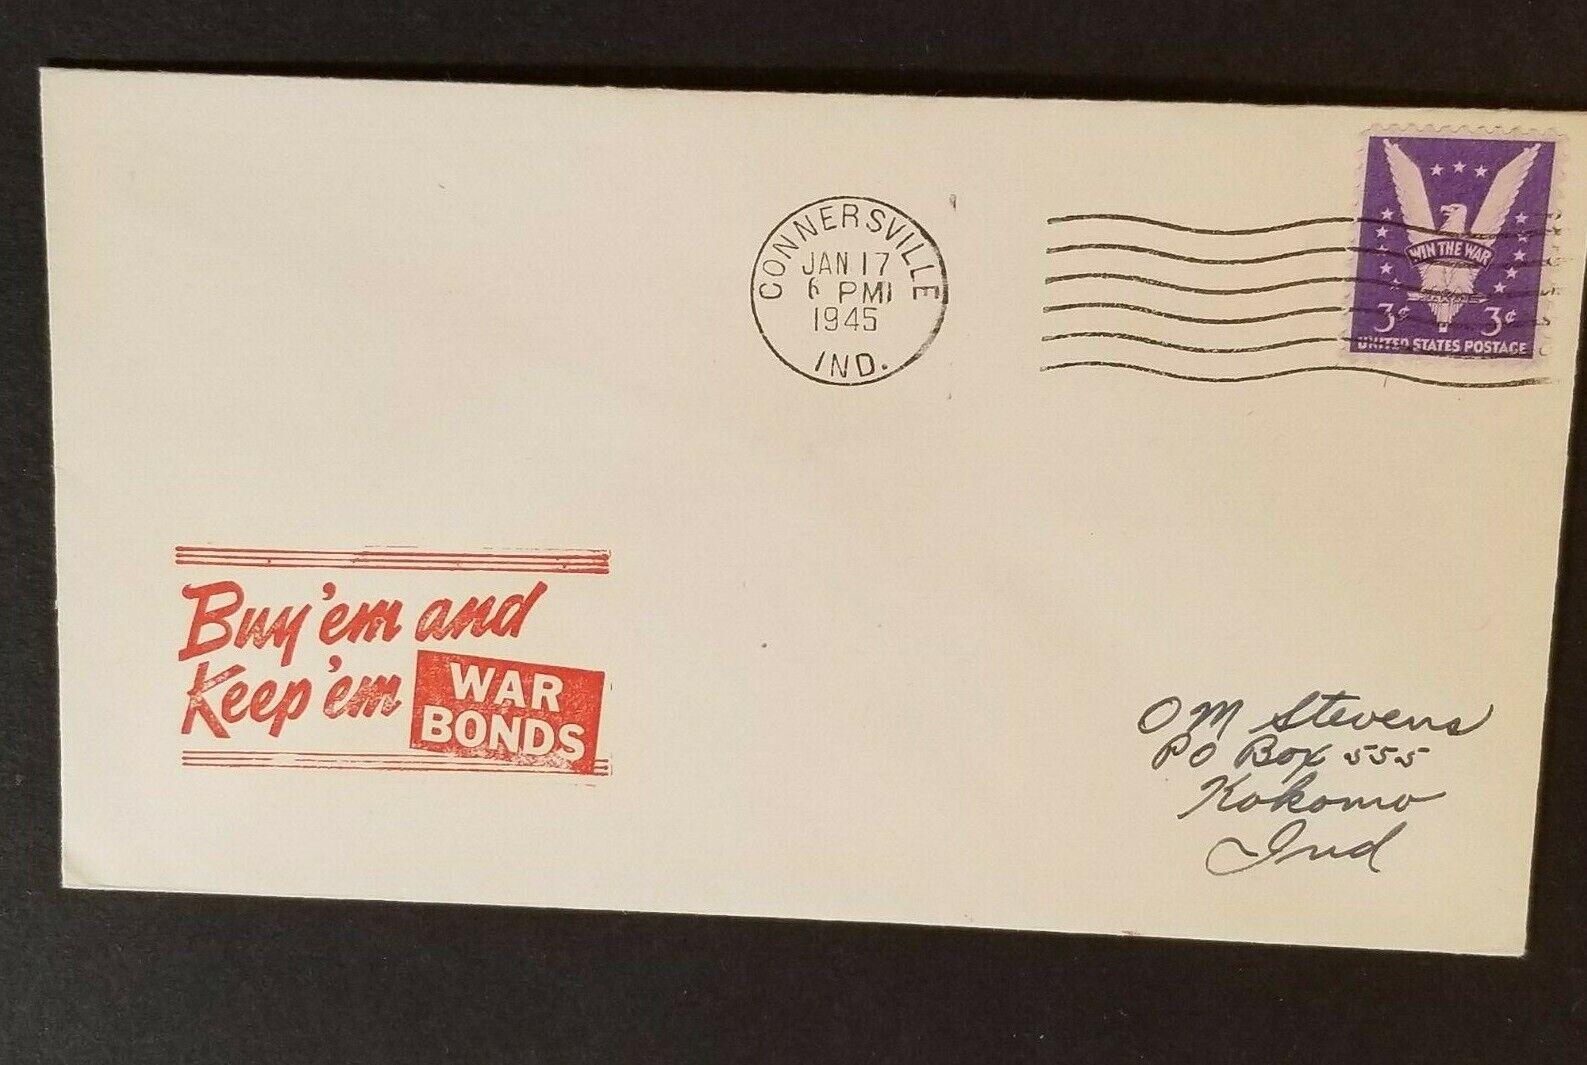 1945 Connersville To Kokomo Indiana Buy War Bonds Patriotic Cover - $24.99